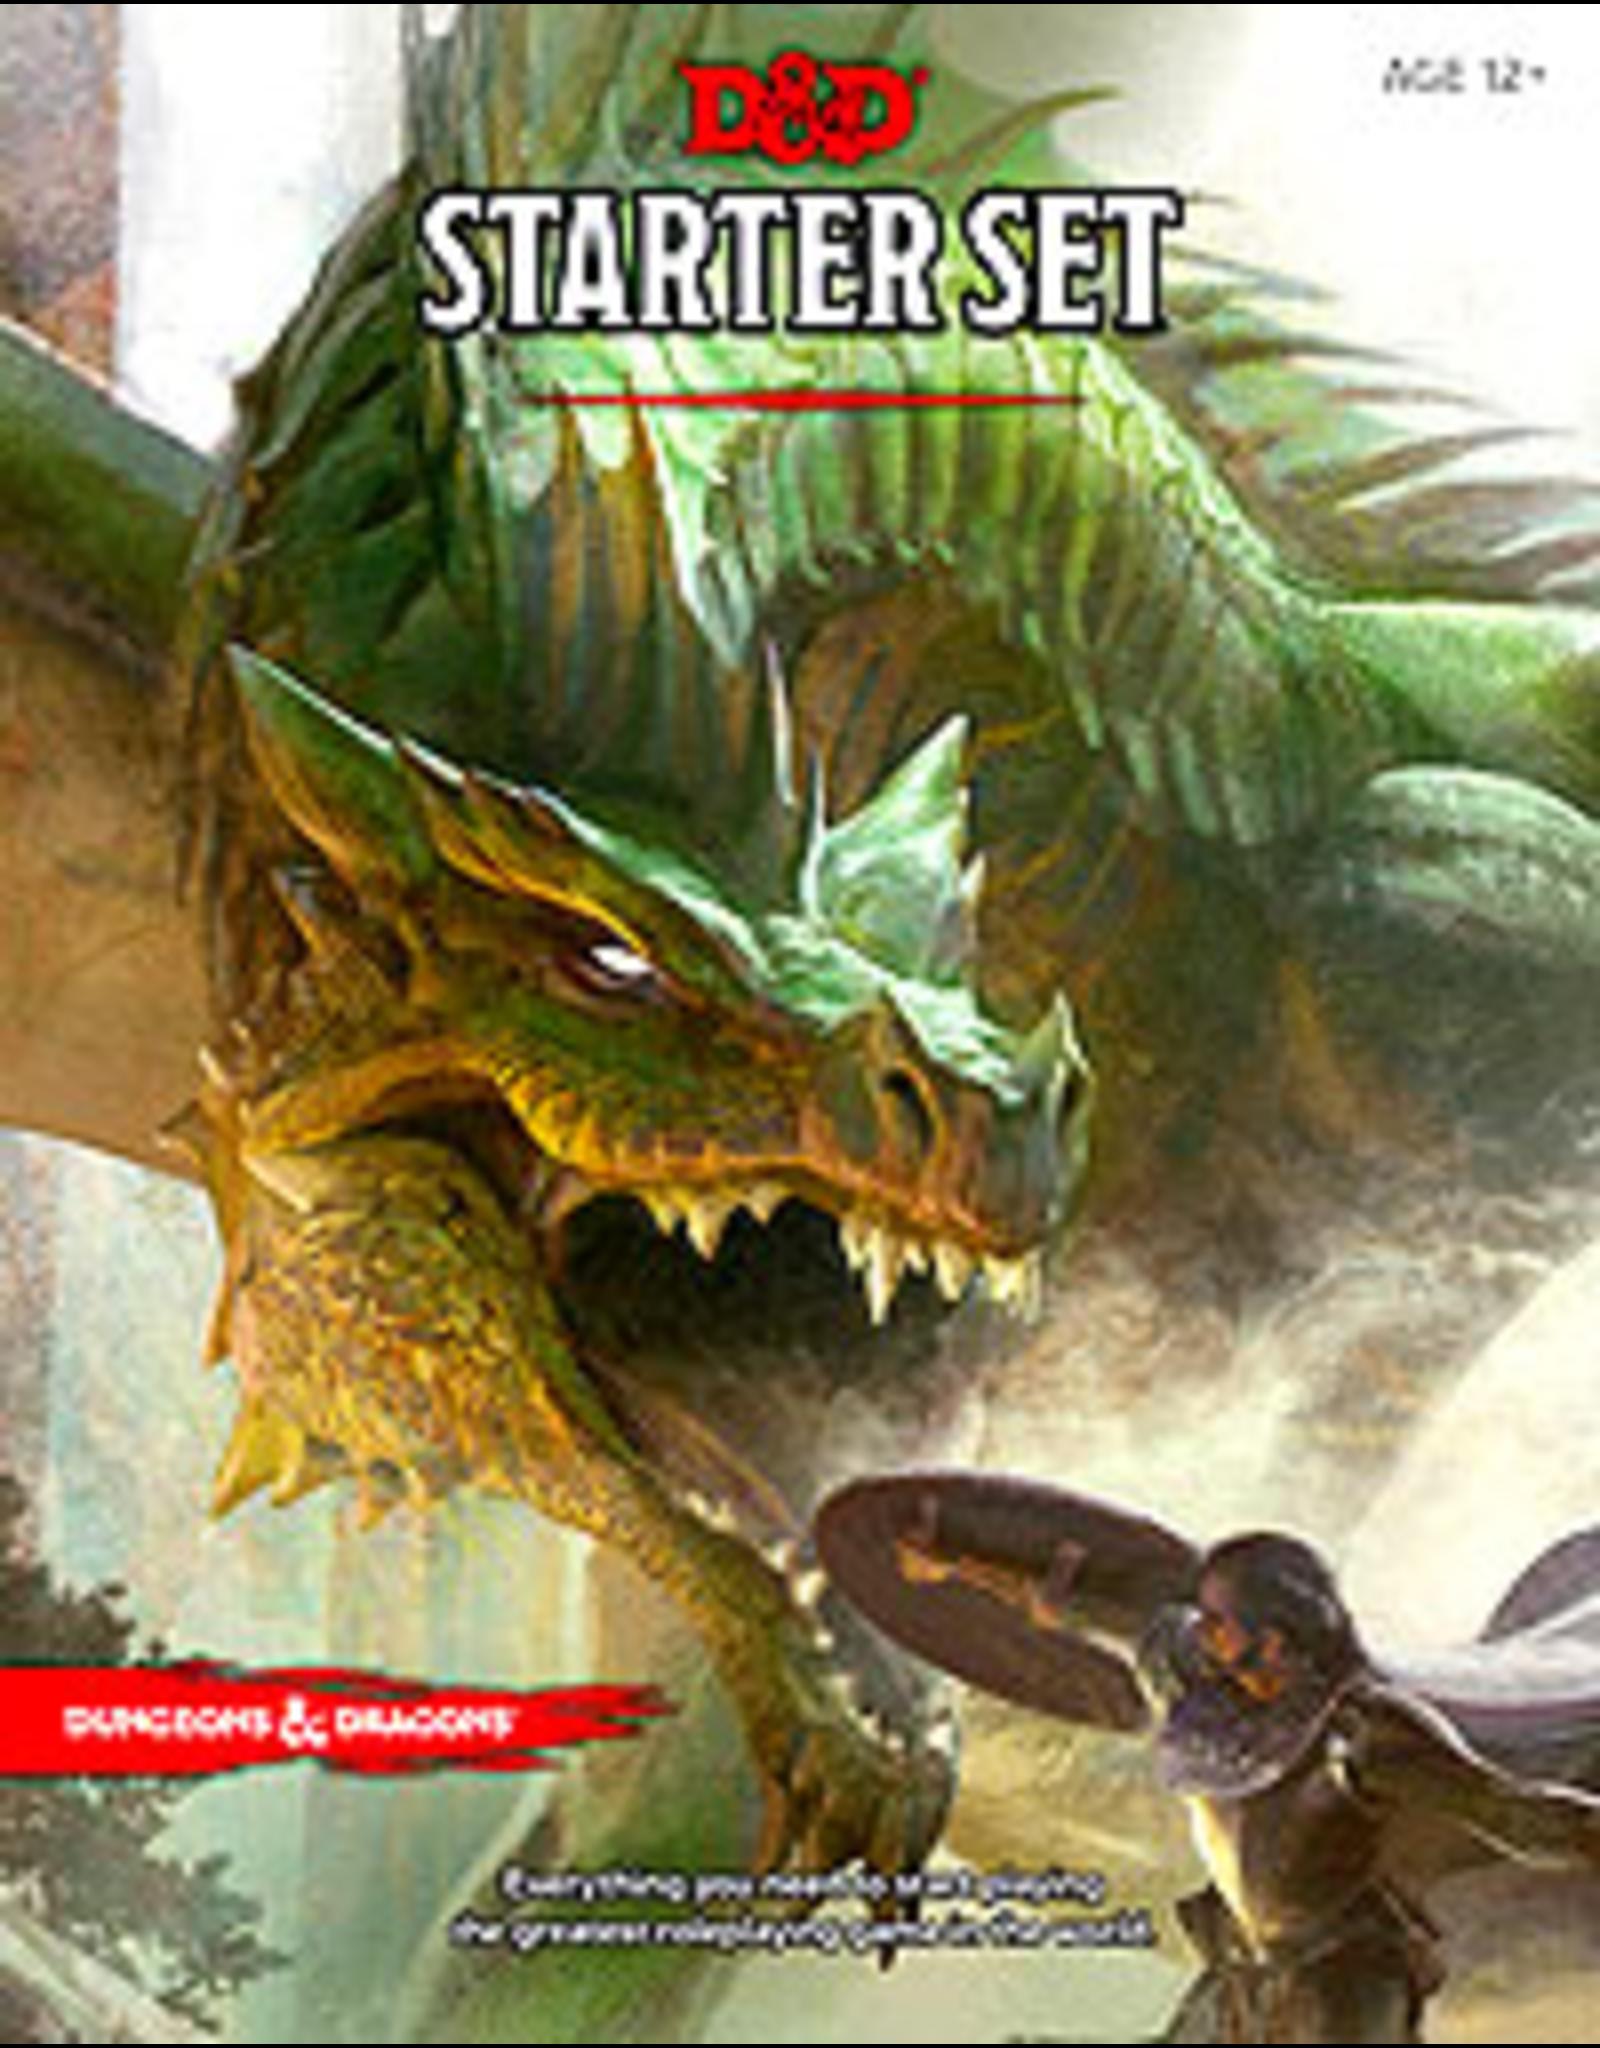 Dungeons & Dragons Dungeons and Dragons Starter Set